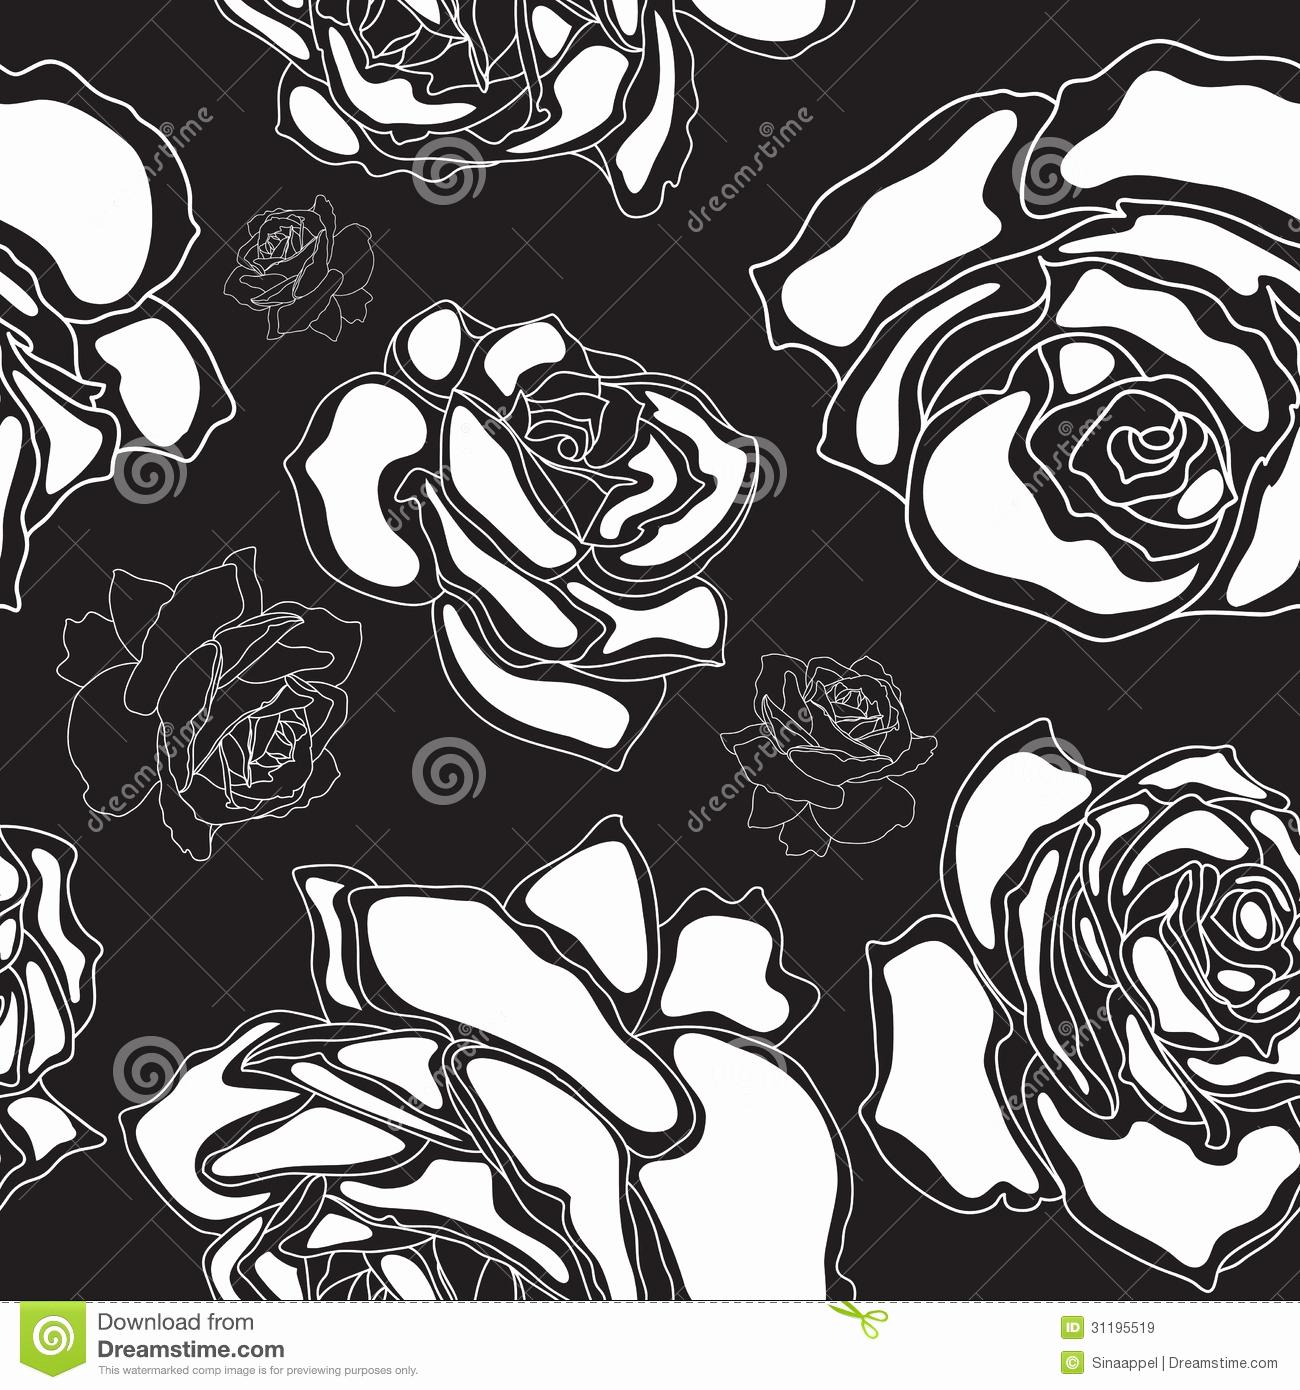 Black and White Illustrations Elegant Seamless Pattern White Roses A Black Backgroun Stock